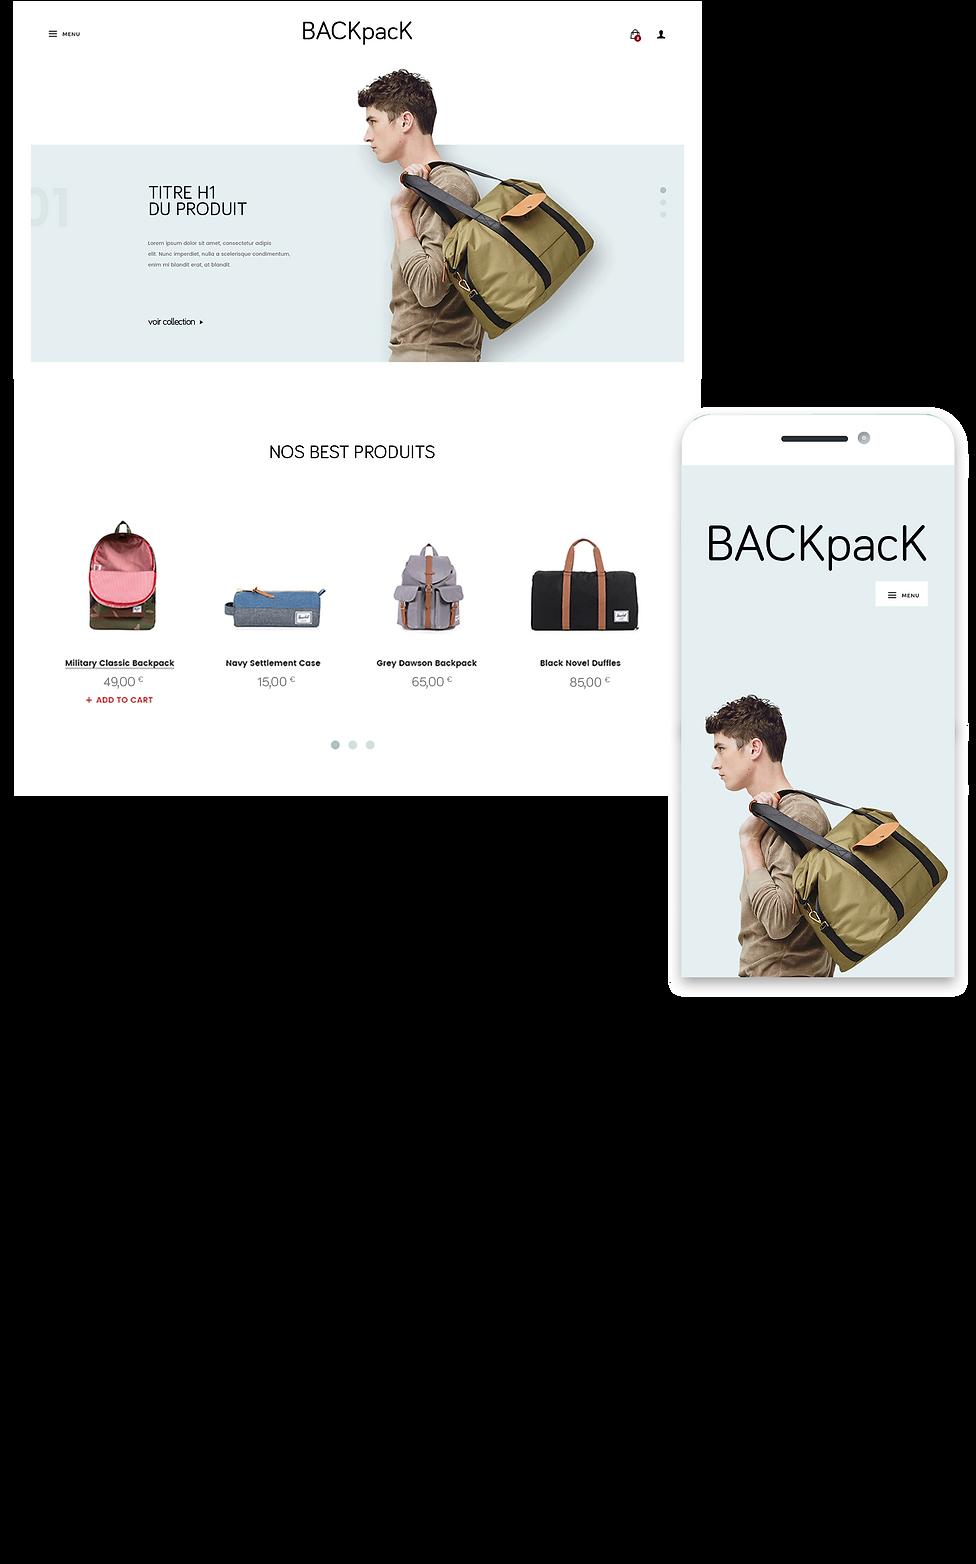 backpack_identite-1.png